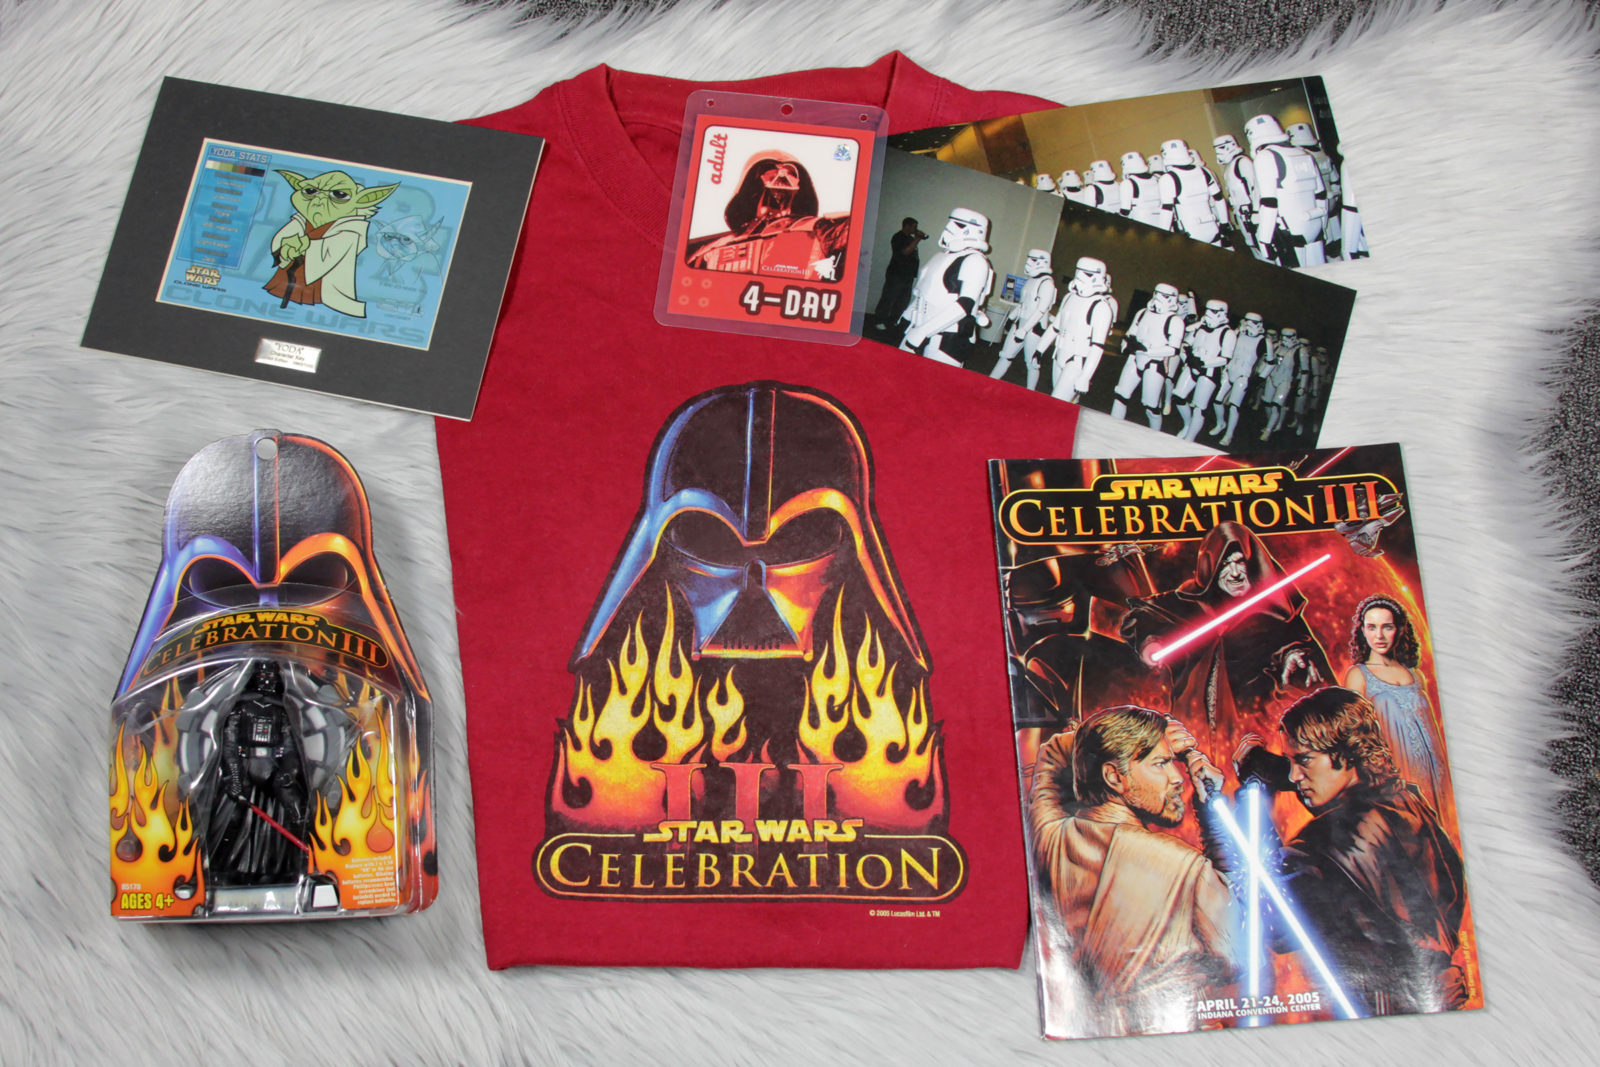 Celebration III T-Shirts and Merch